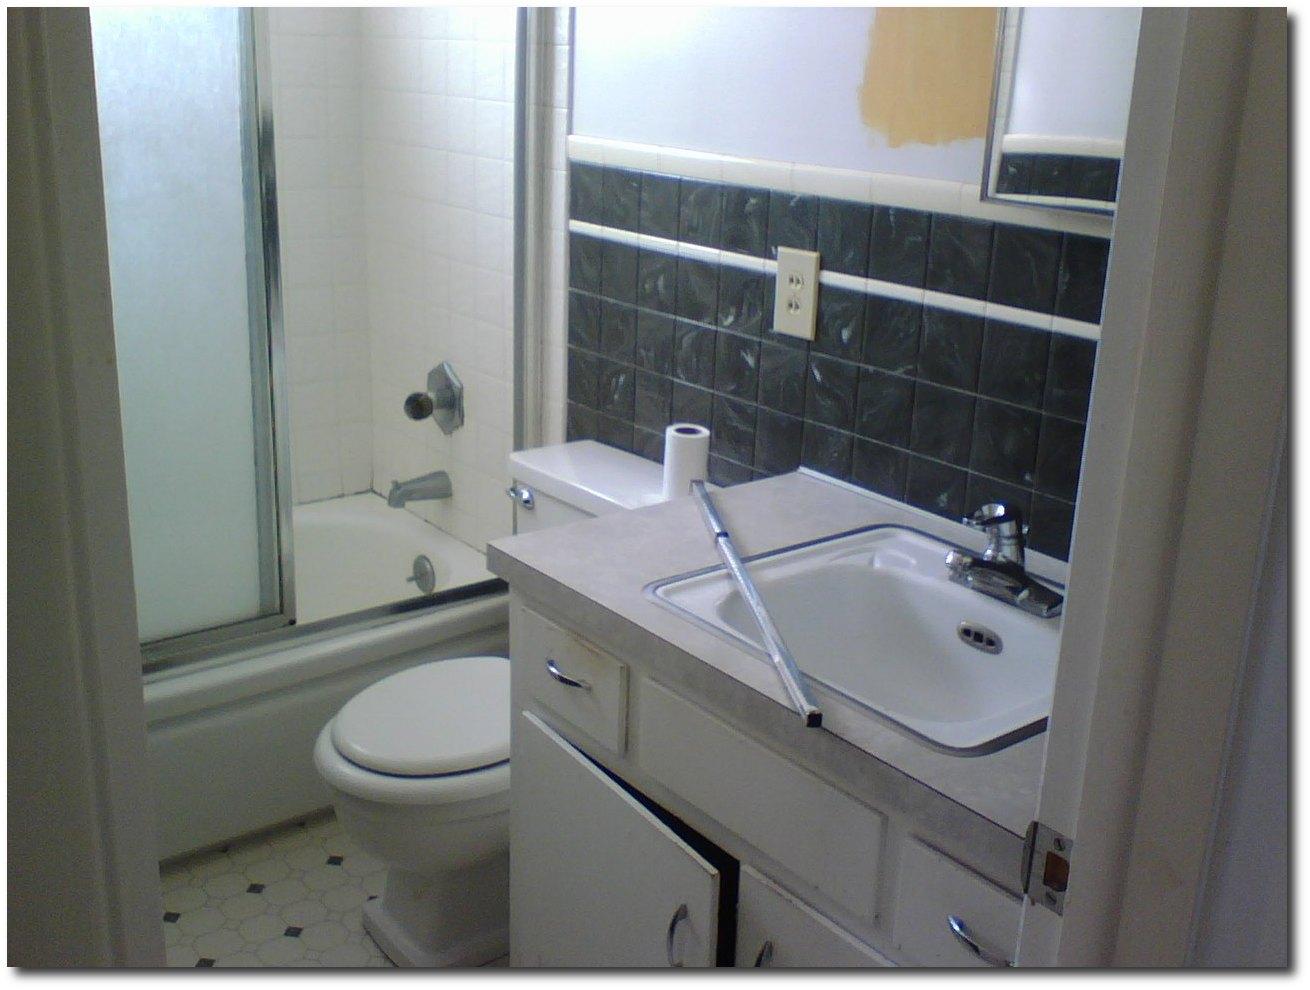 Bathroom Remodel Highlands Ranch handyman works • gallery • bathroom remodeling and handyman